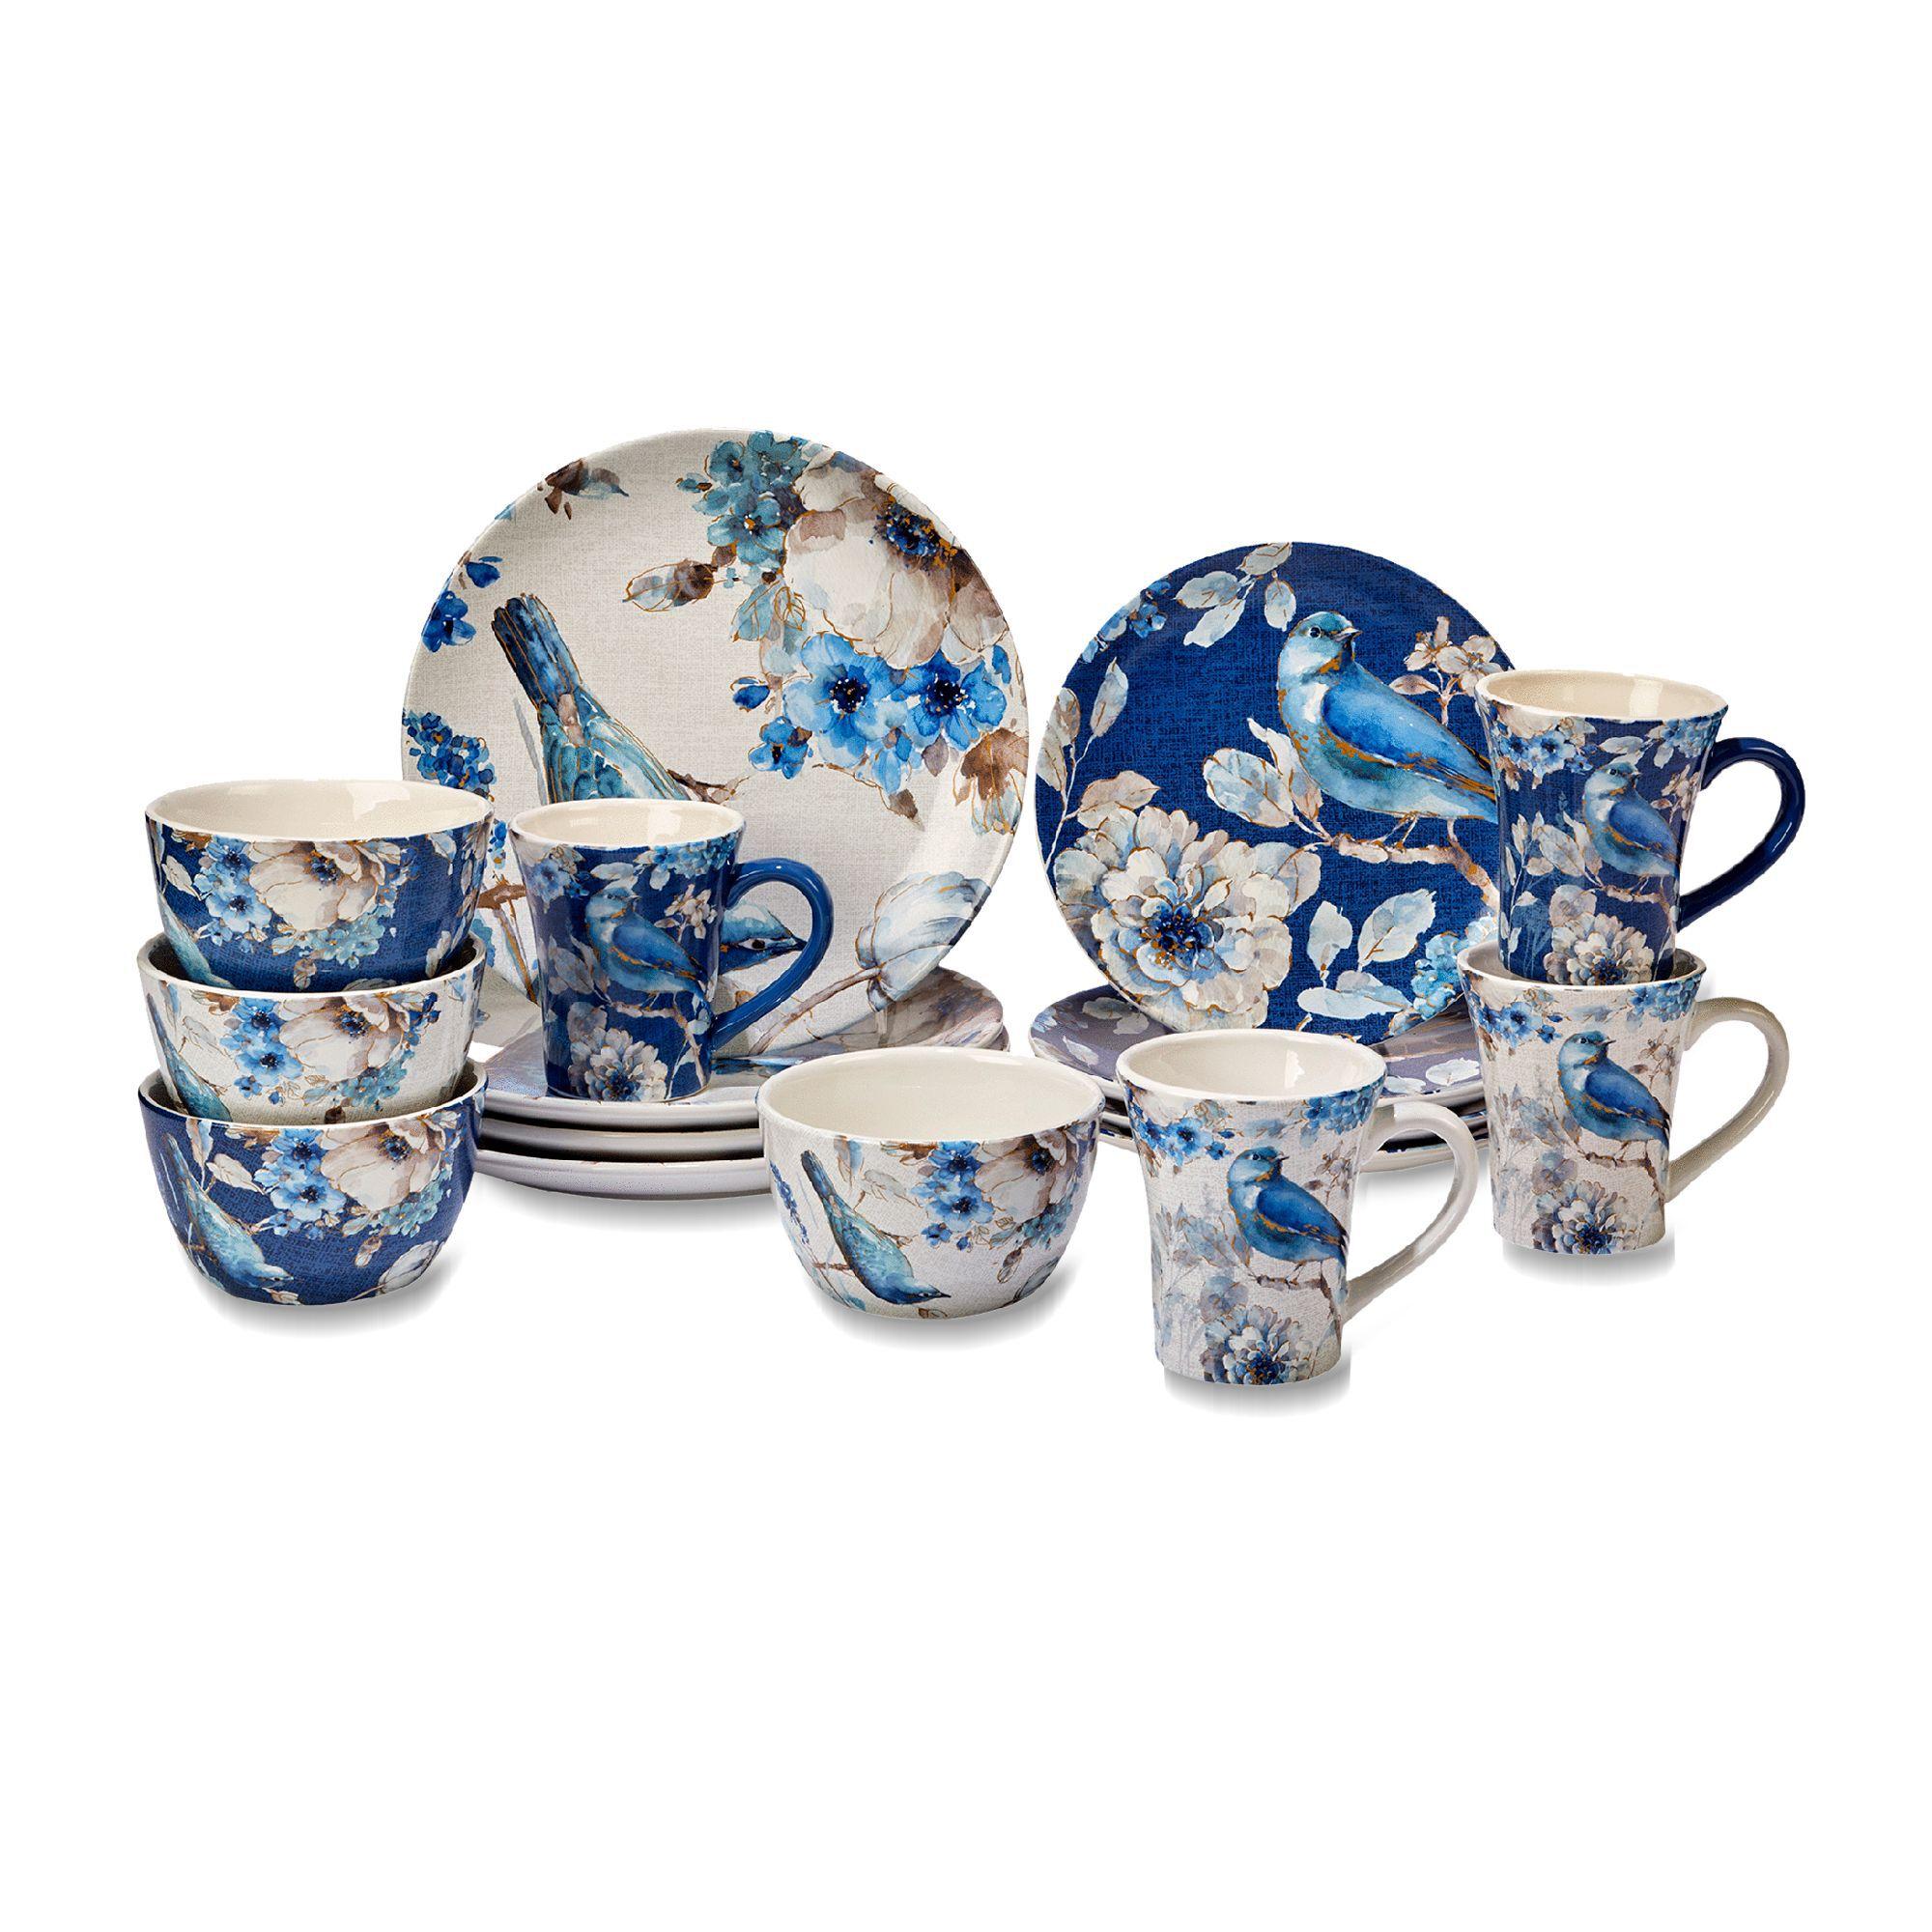 Lisa Audit u0026quot;Indigoldu0026quot; Ceramic Dinnerware  default  sc 1 st  Ross-Simons & Lisa Audit